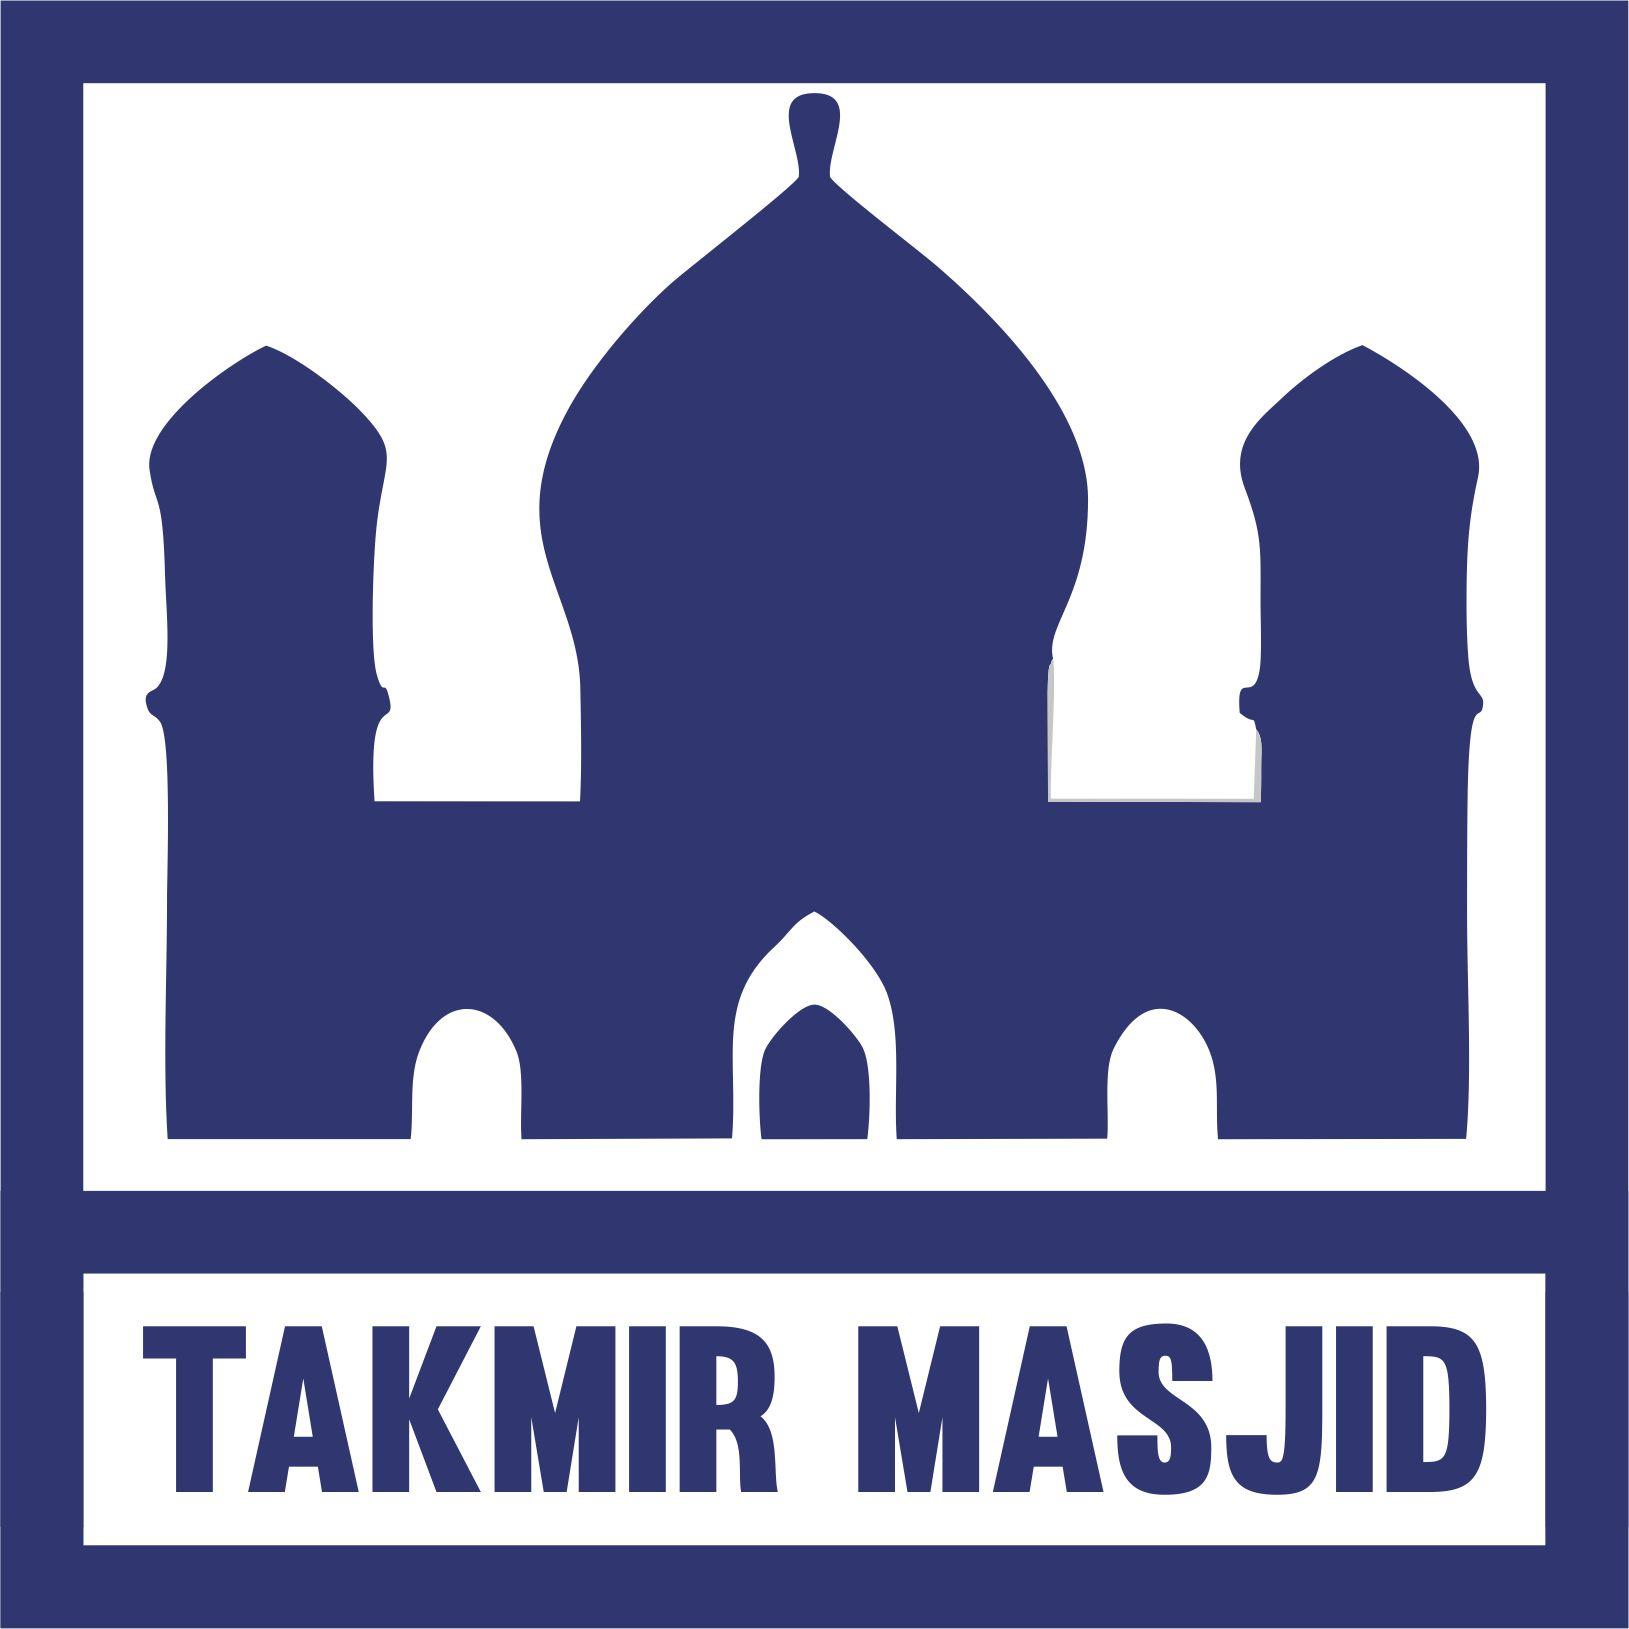 stempel takmir masjid